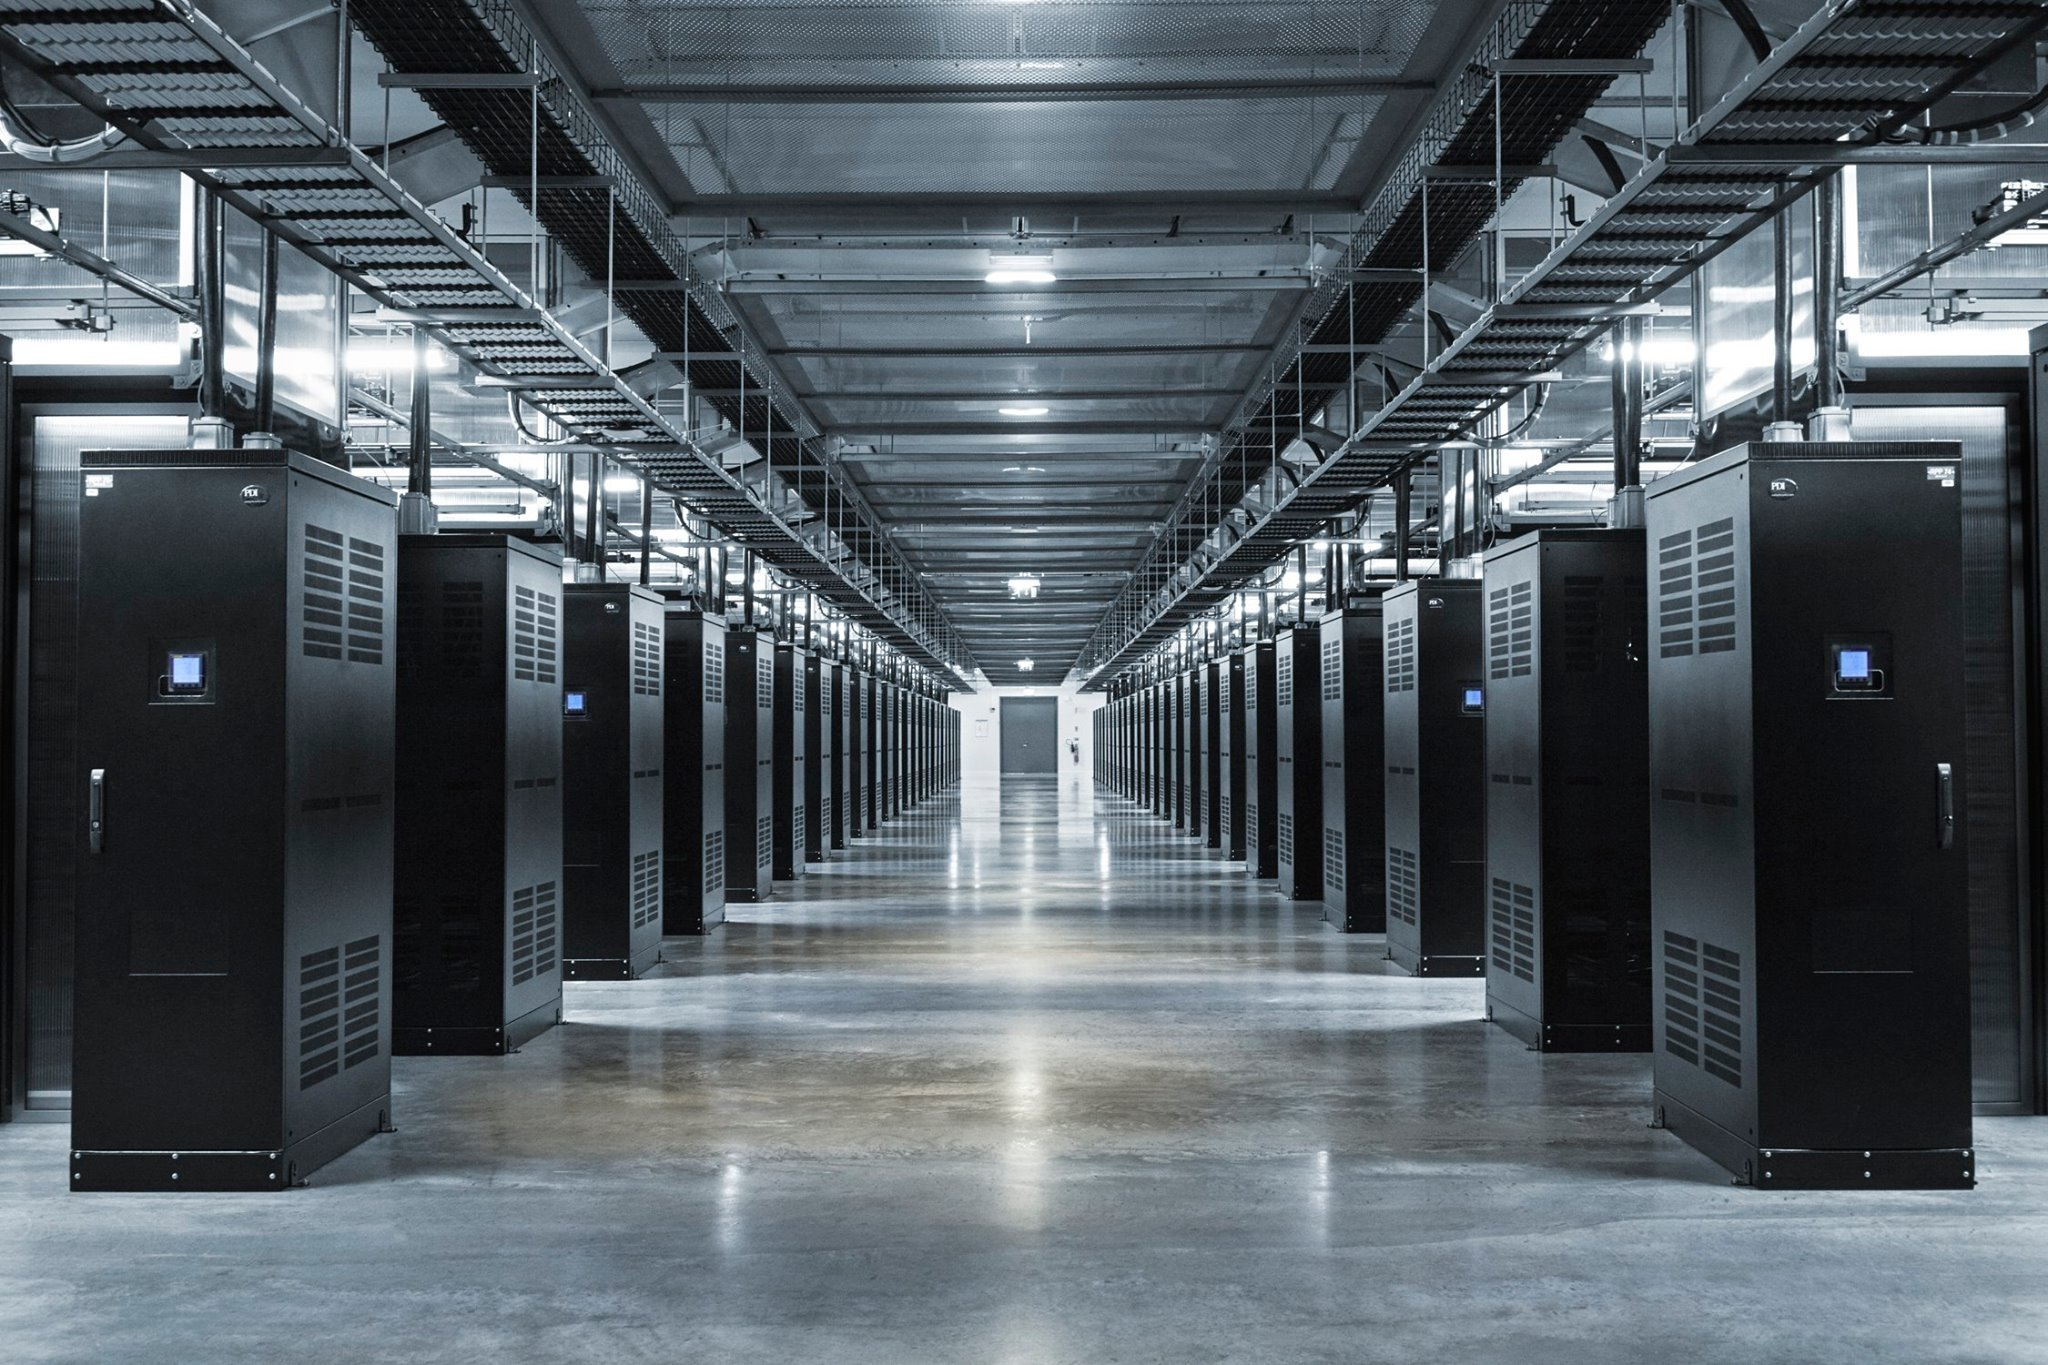 Катастрофоустойчивость корпоративного дата-центра как услуга